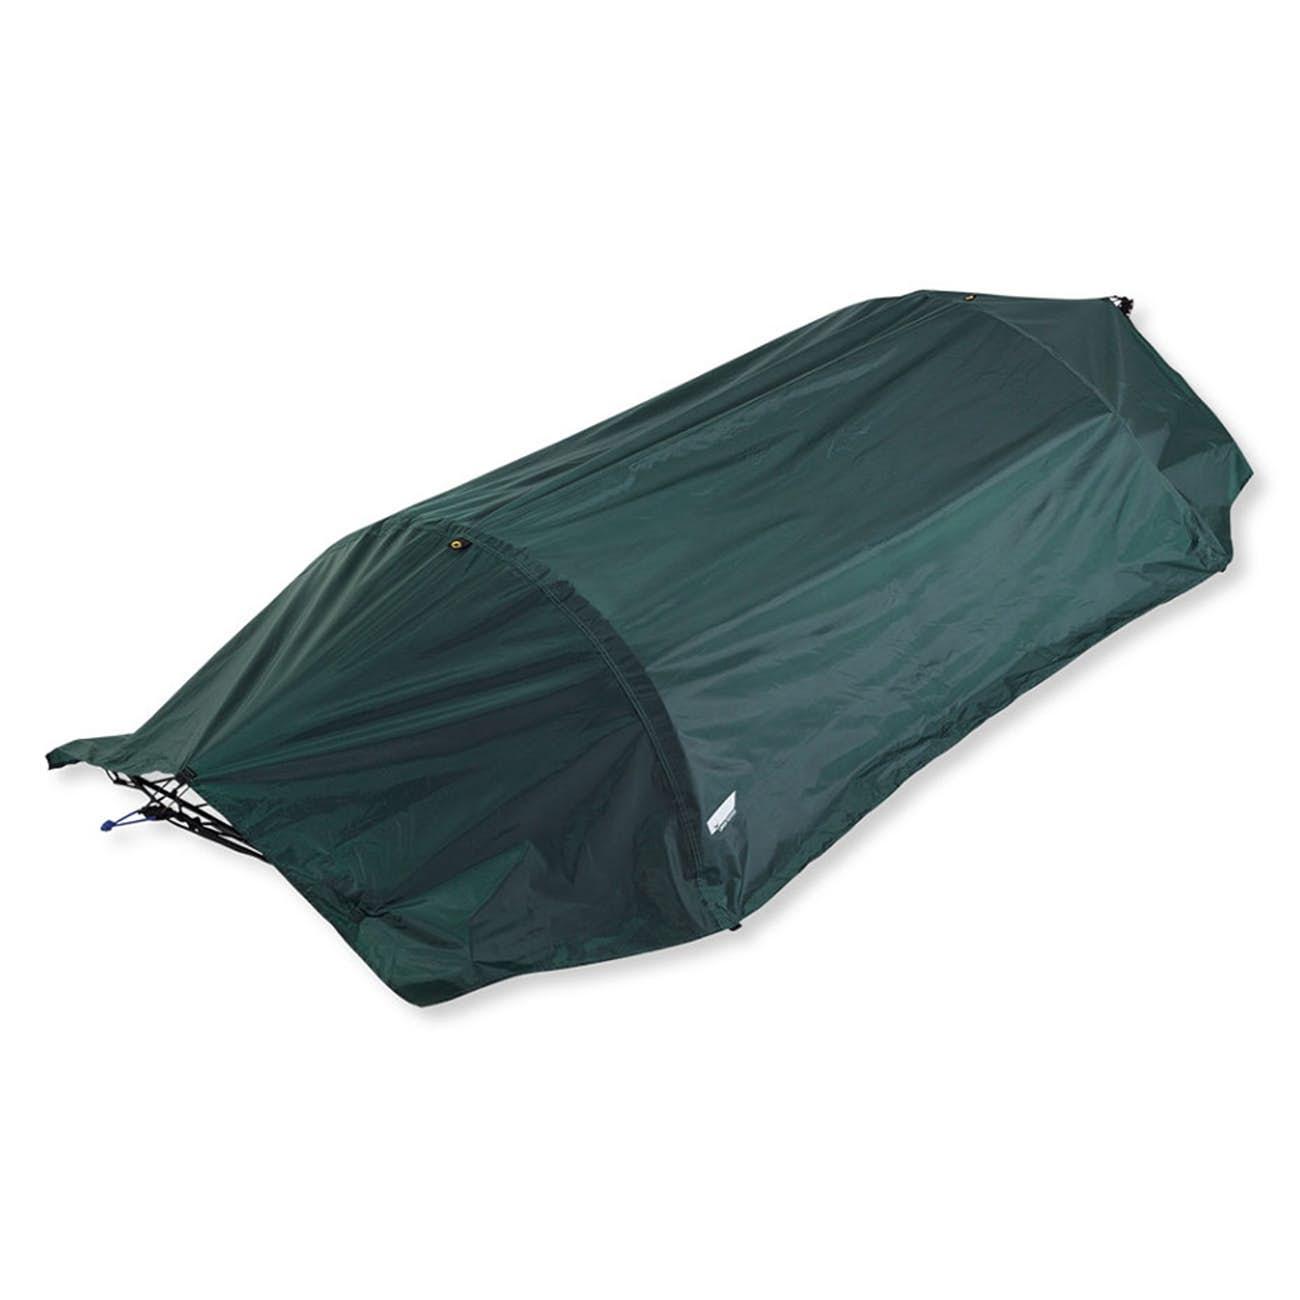 blue ridge camping hammock and tent u2013heavenly hanging blue ridge camping hammock and tent  heavenly hanging  rh   gearforlife